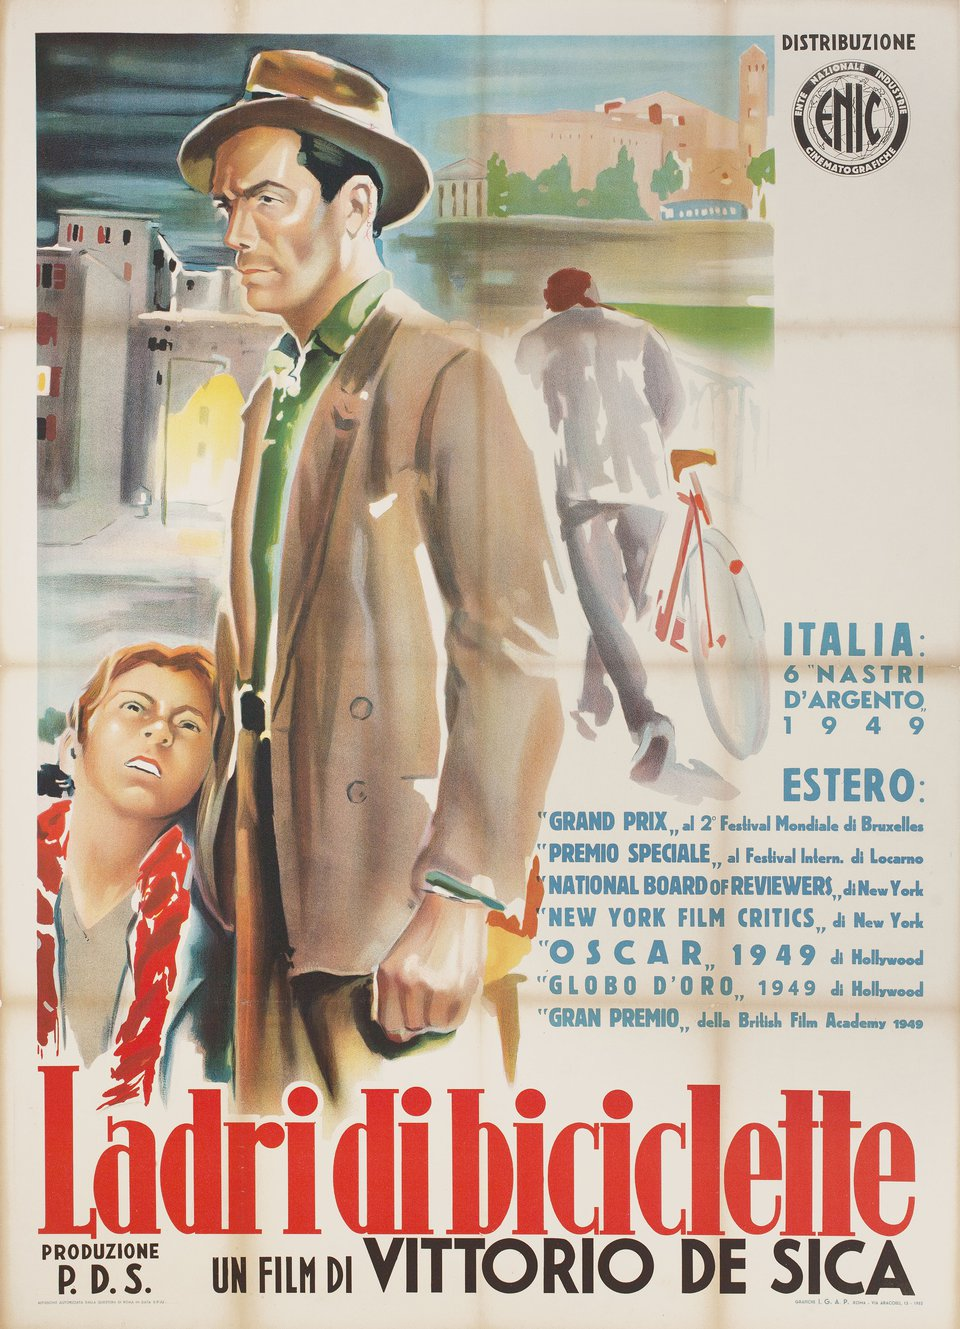 The Bicycle Thief R1952 Italian Due Fogli Poster